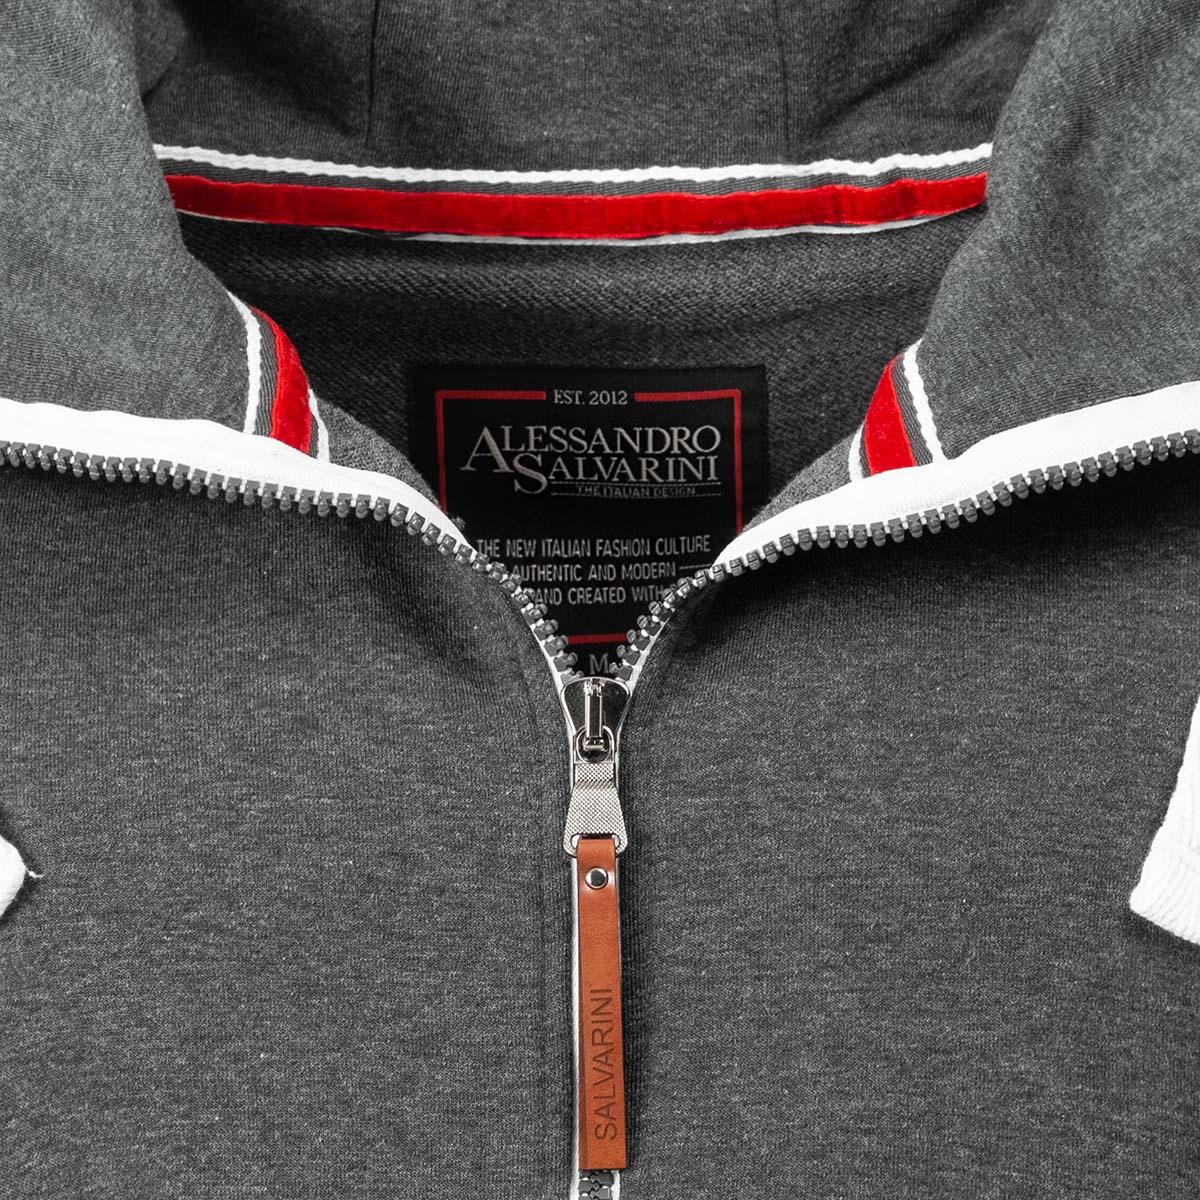 A-Salvarini-Herren-Sweatjacke-Kapuzenpullover-Jacke-Kapuze-Hoodie-Sweater-AS192 Indexbild 20